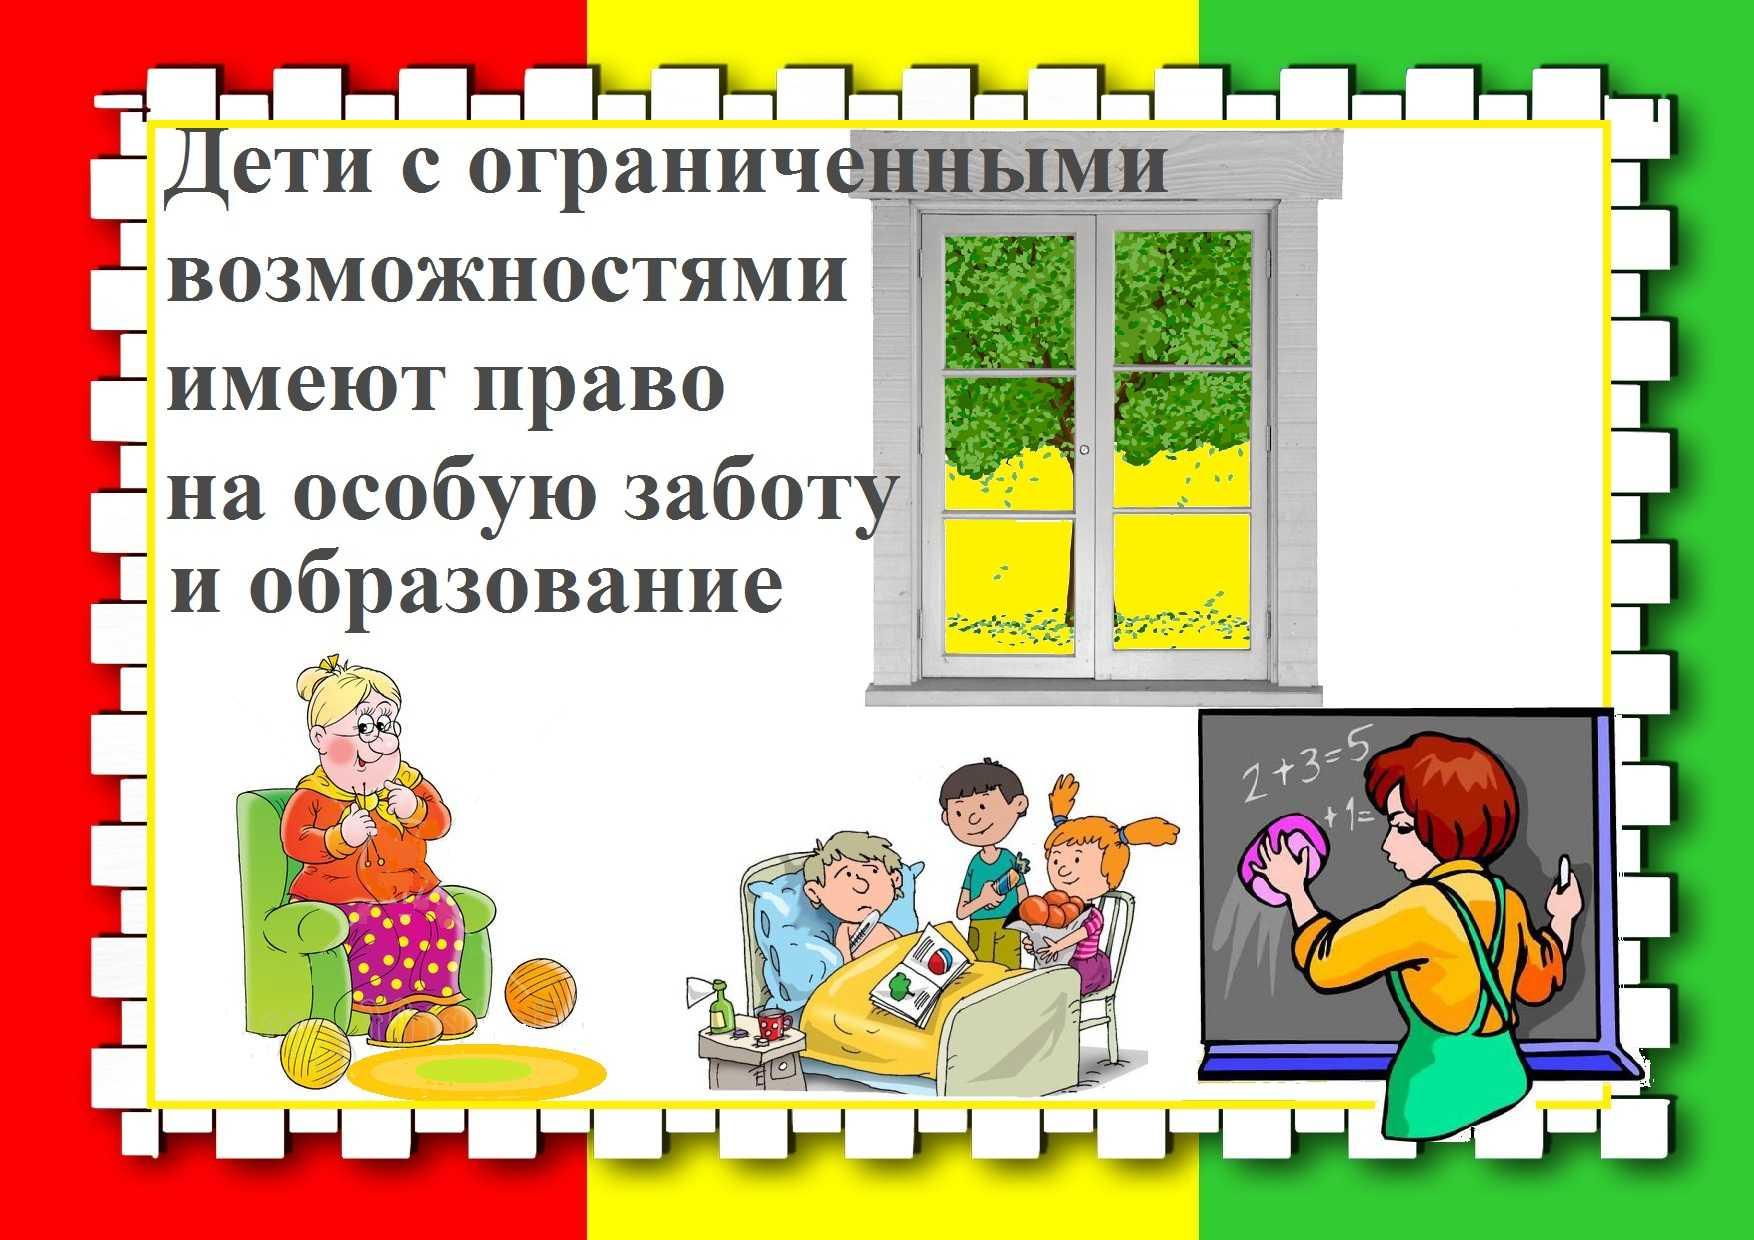 C:\Users\Татьяна\Desktop\ПРАВА ДЕТЕЙ\hello_html_1160196a.jpg